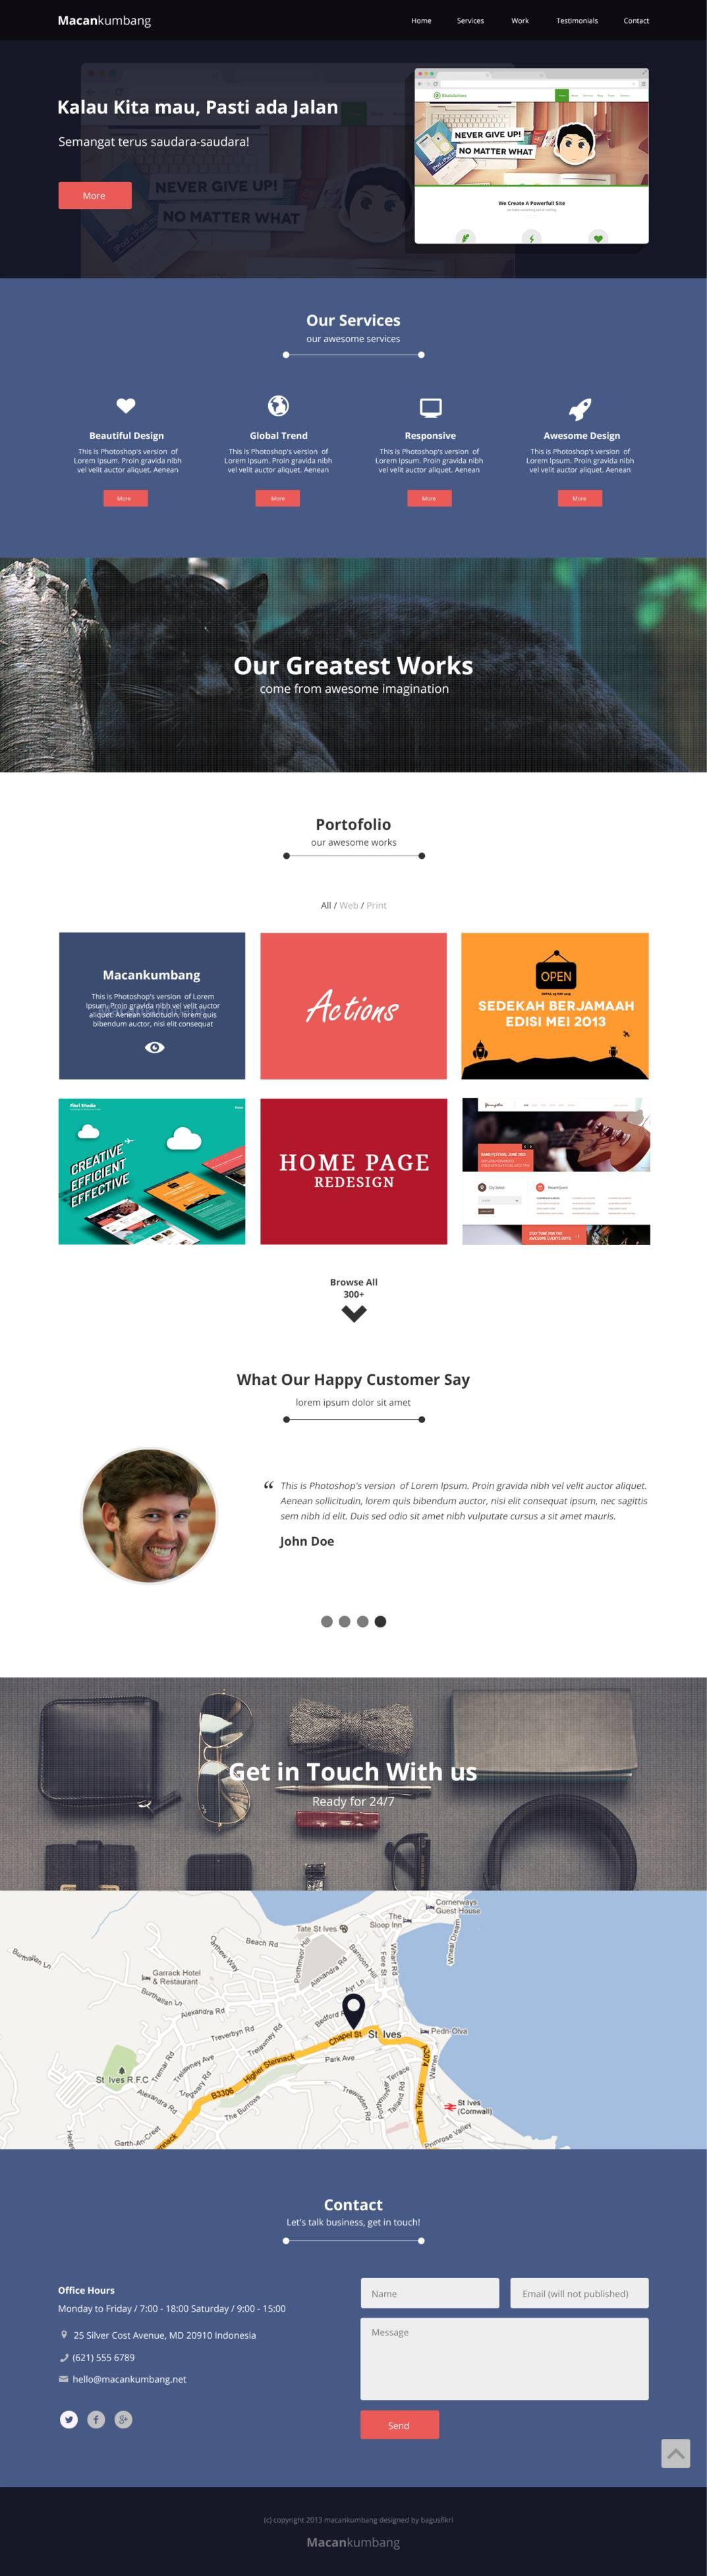 Emejing Design Home Page In Html Images - Decoration Design Ideas ...